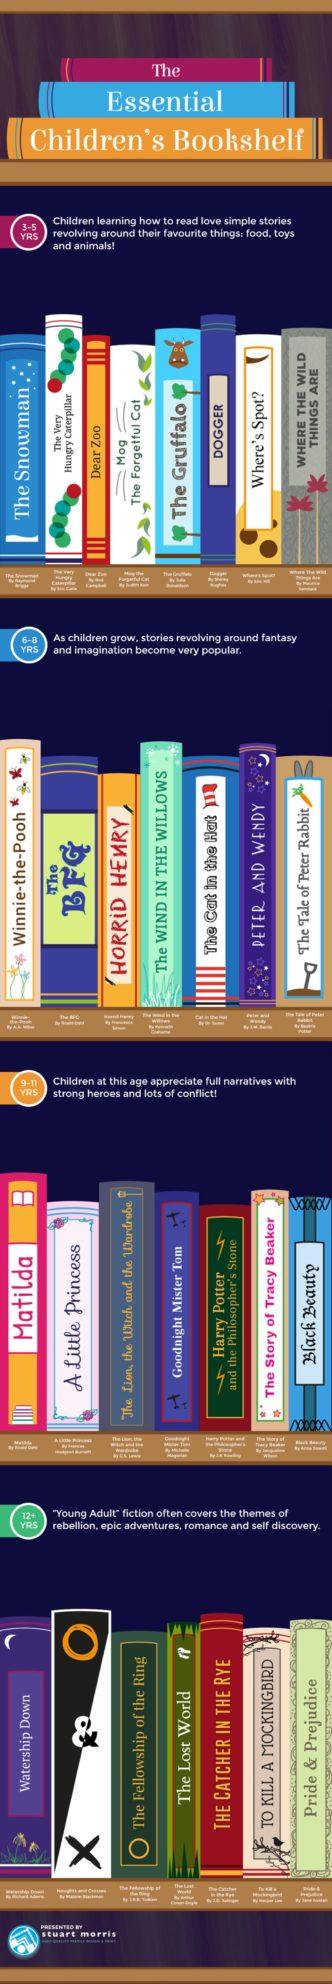 The essential children's bookshelf #infographic